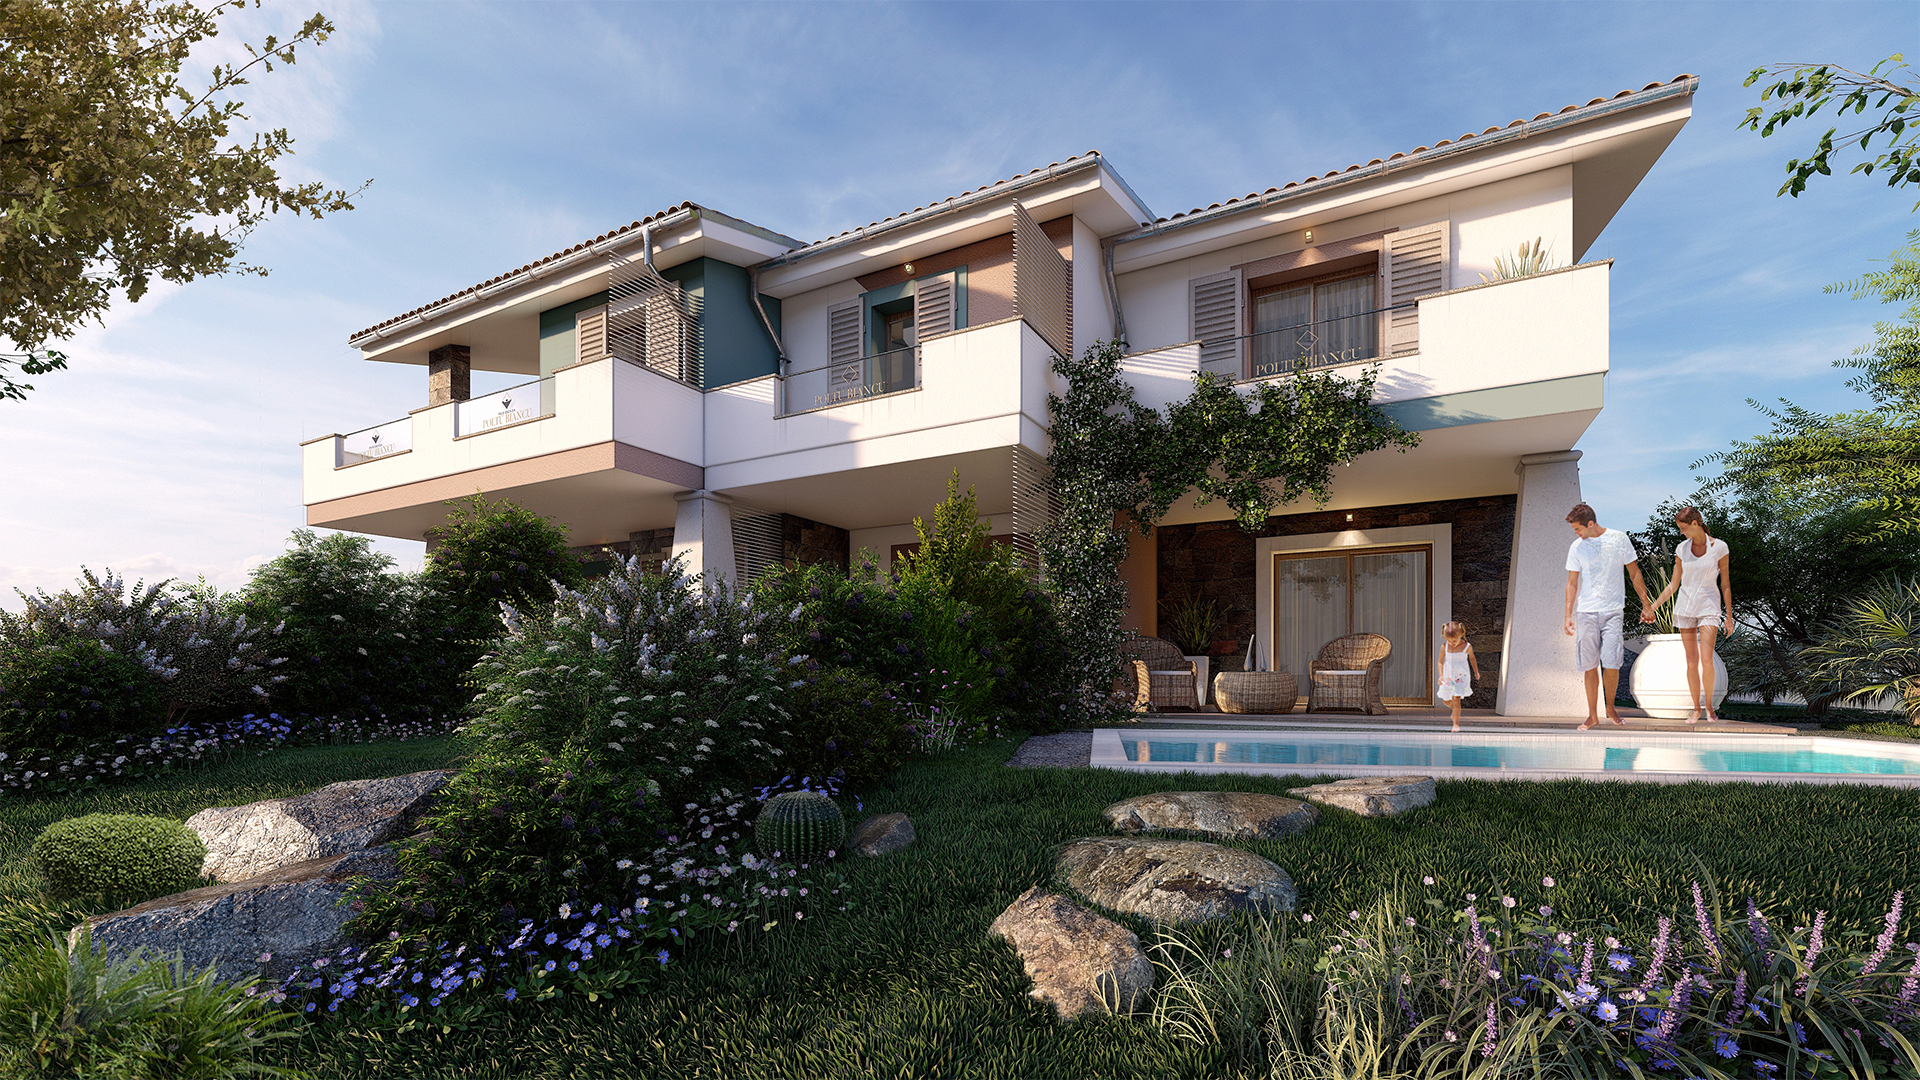 homepage-en-maguledda-immobiliare